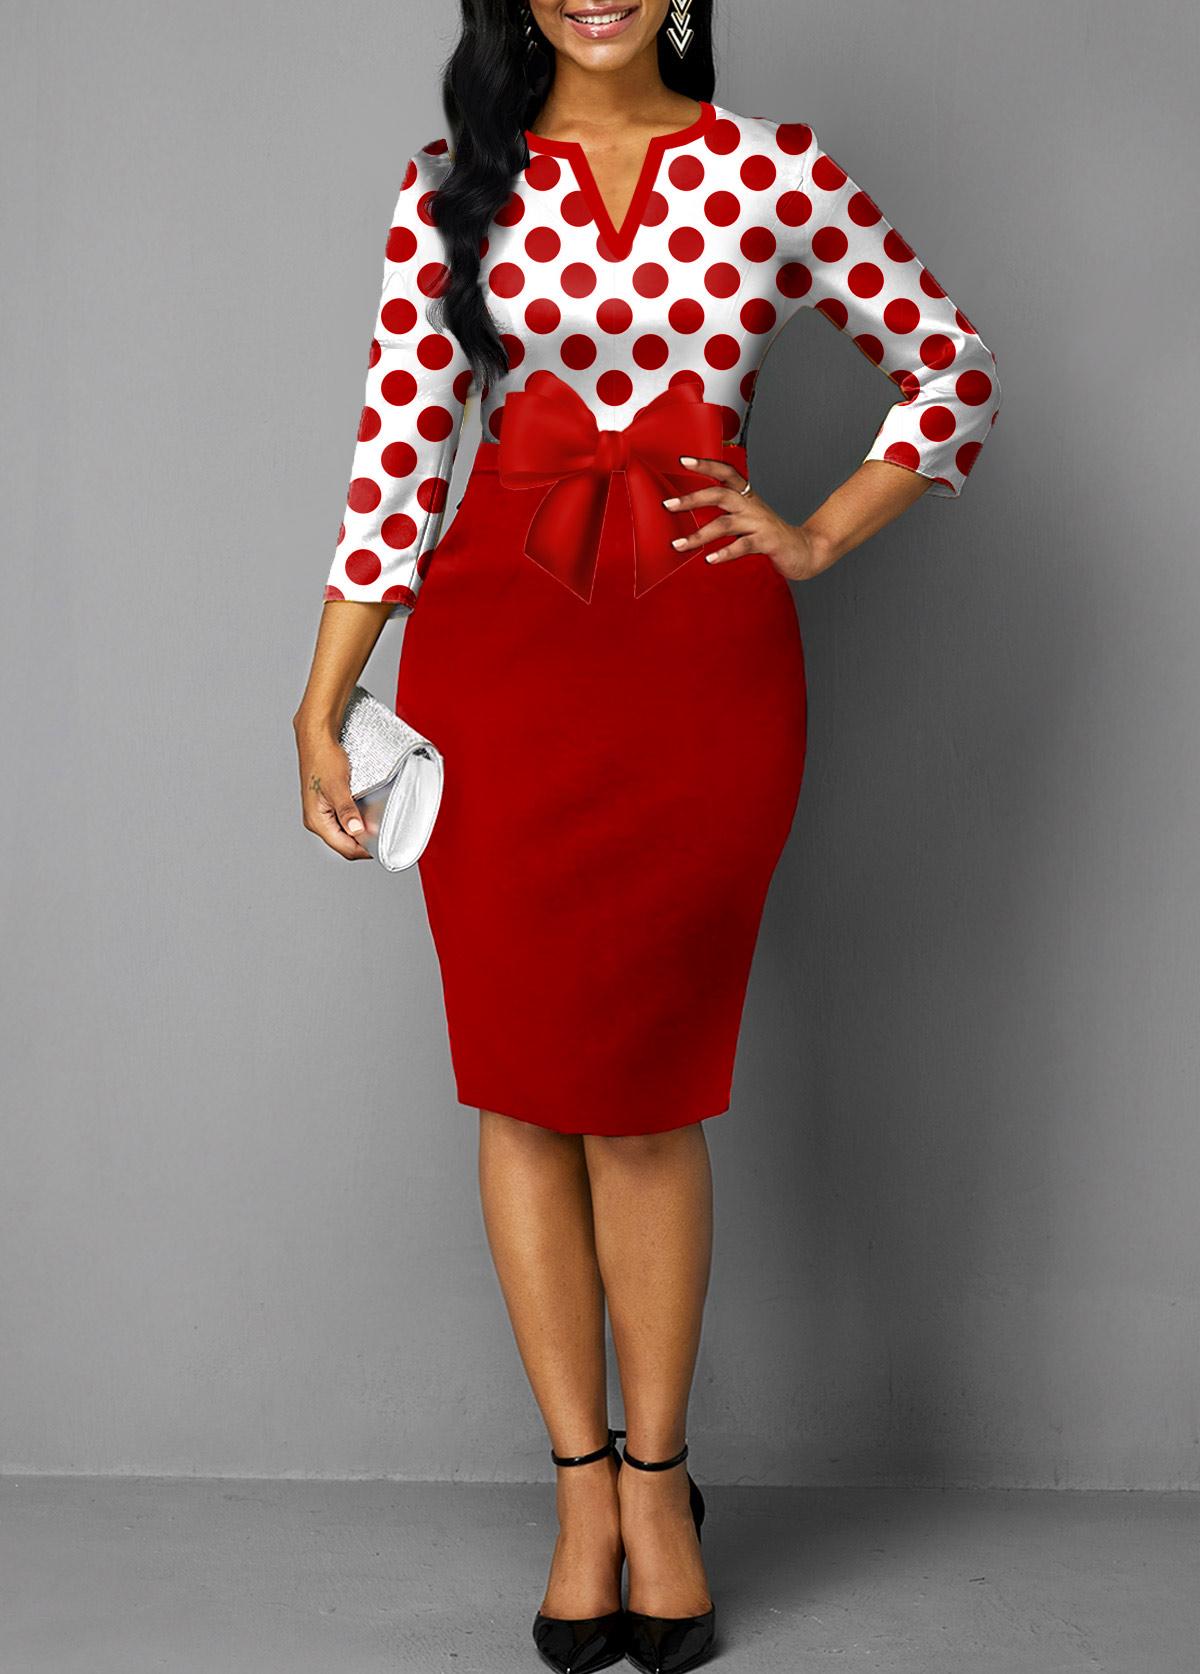 ROTITA Split Neck Red Polka Dot Bowknot Dress